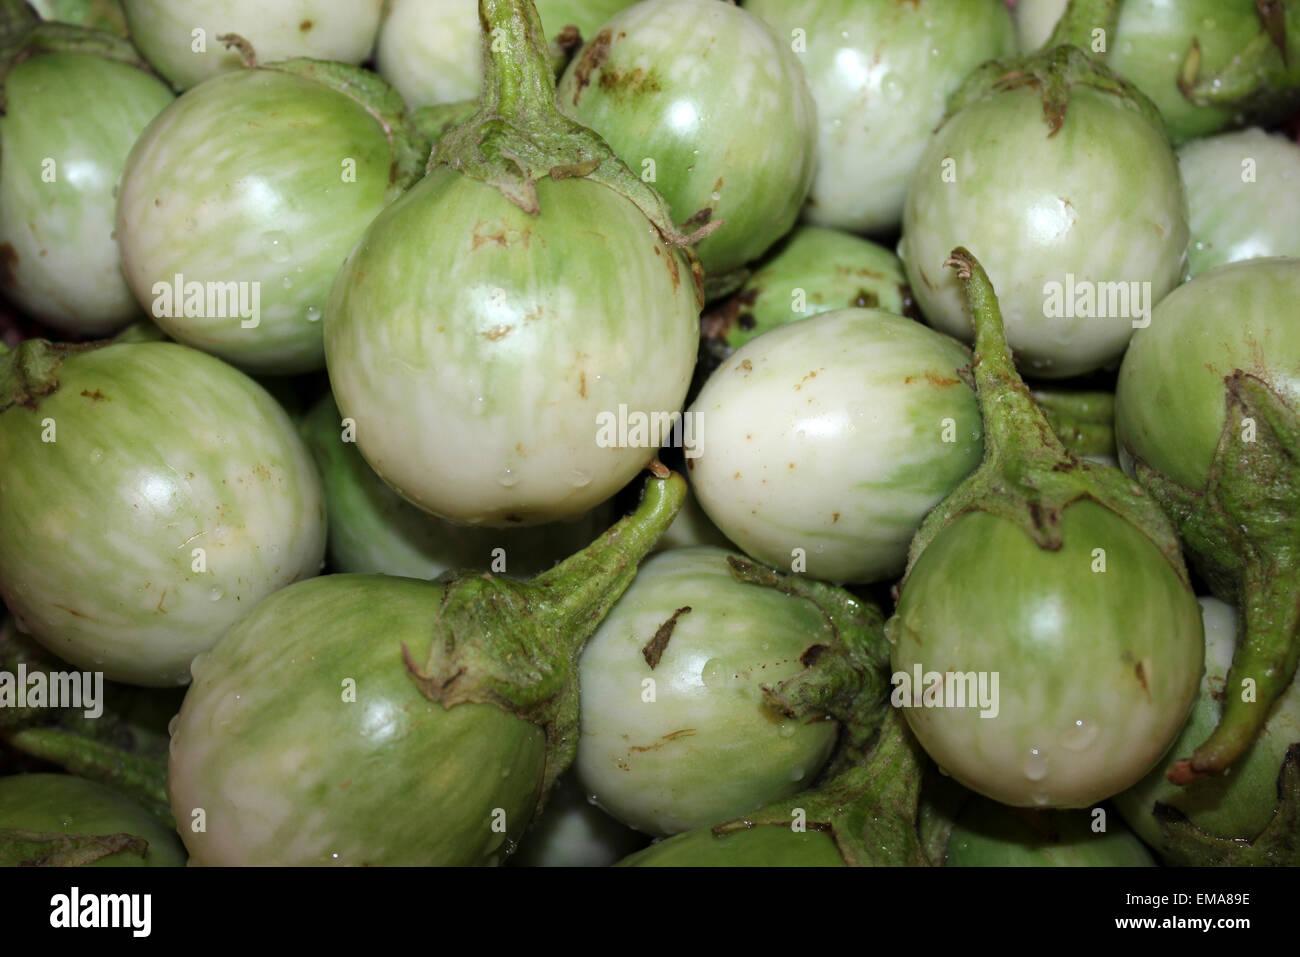 Thai Eggplant Solanum melongena locally known as Makhuea pro Stock Photo